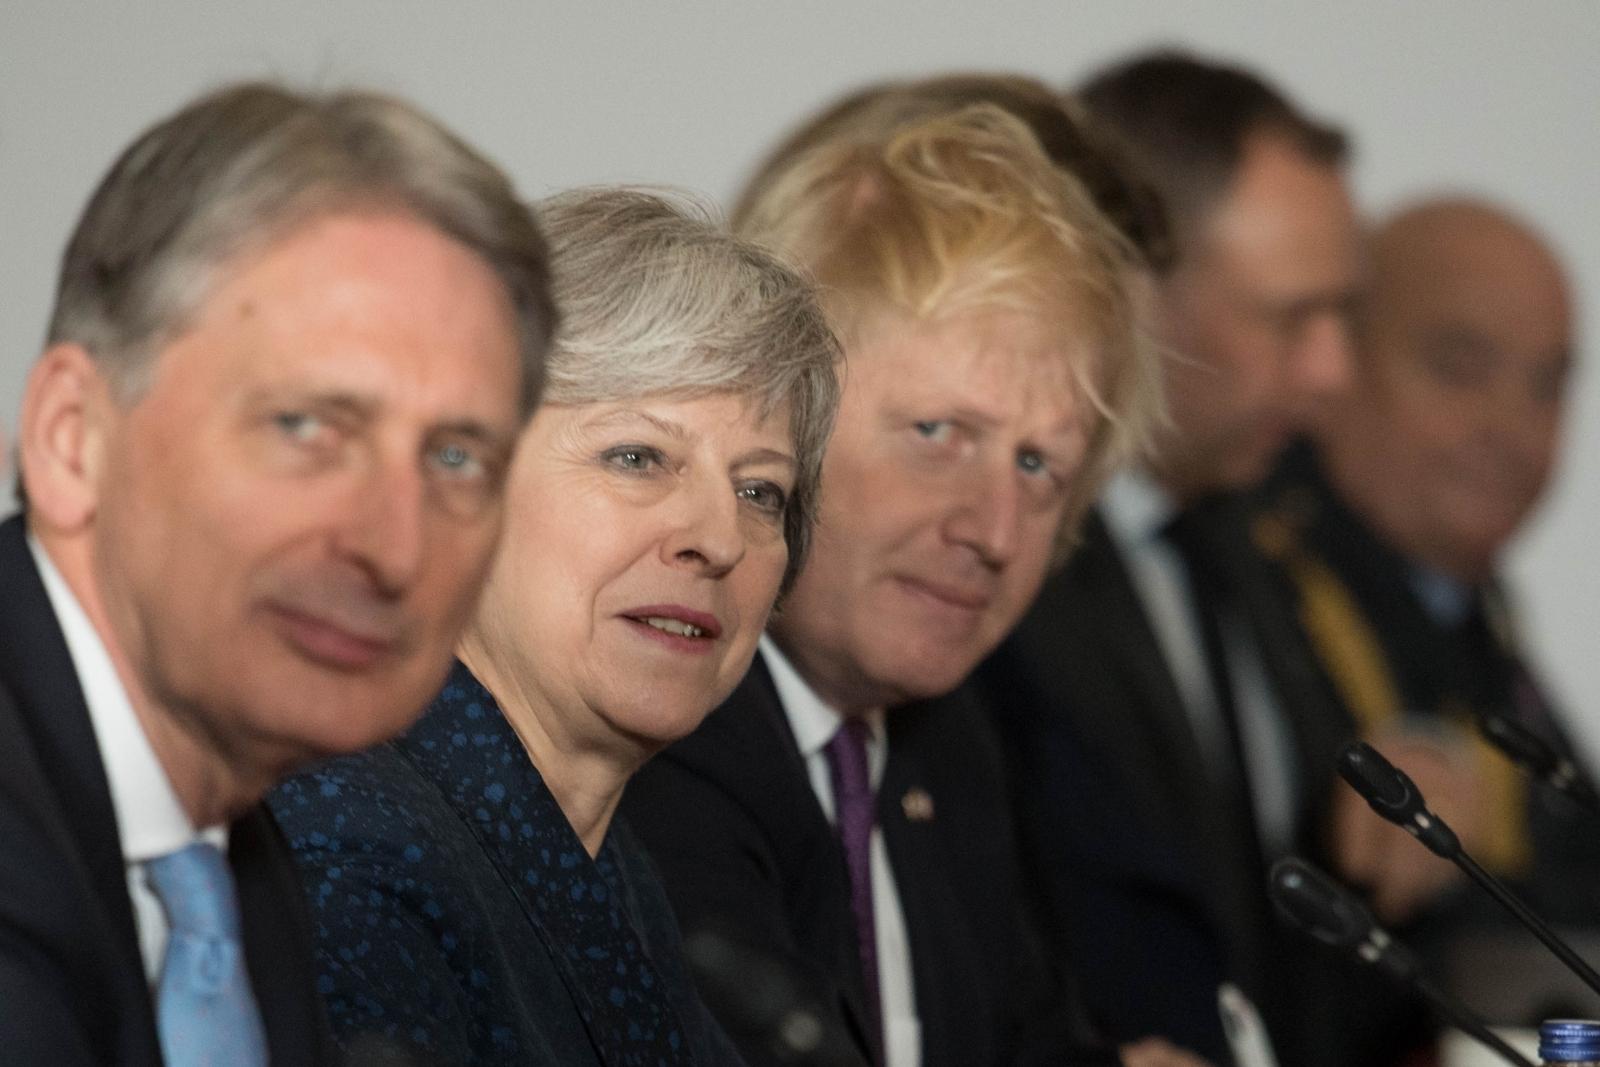 T May, B Johnson and P Hammond